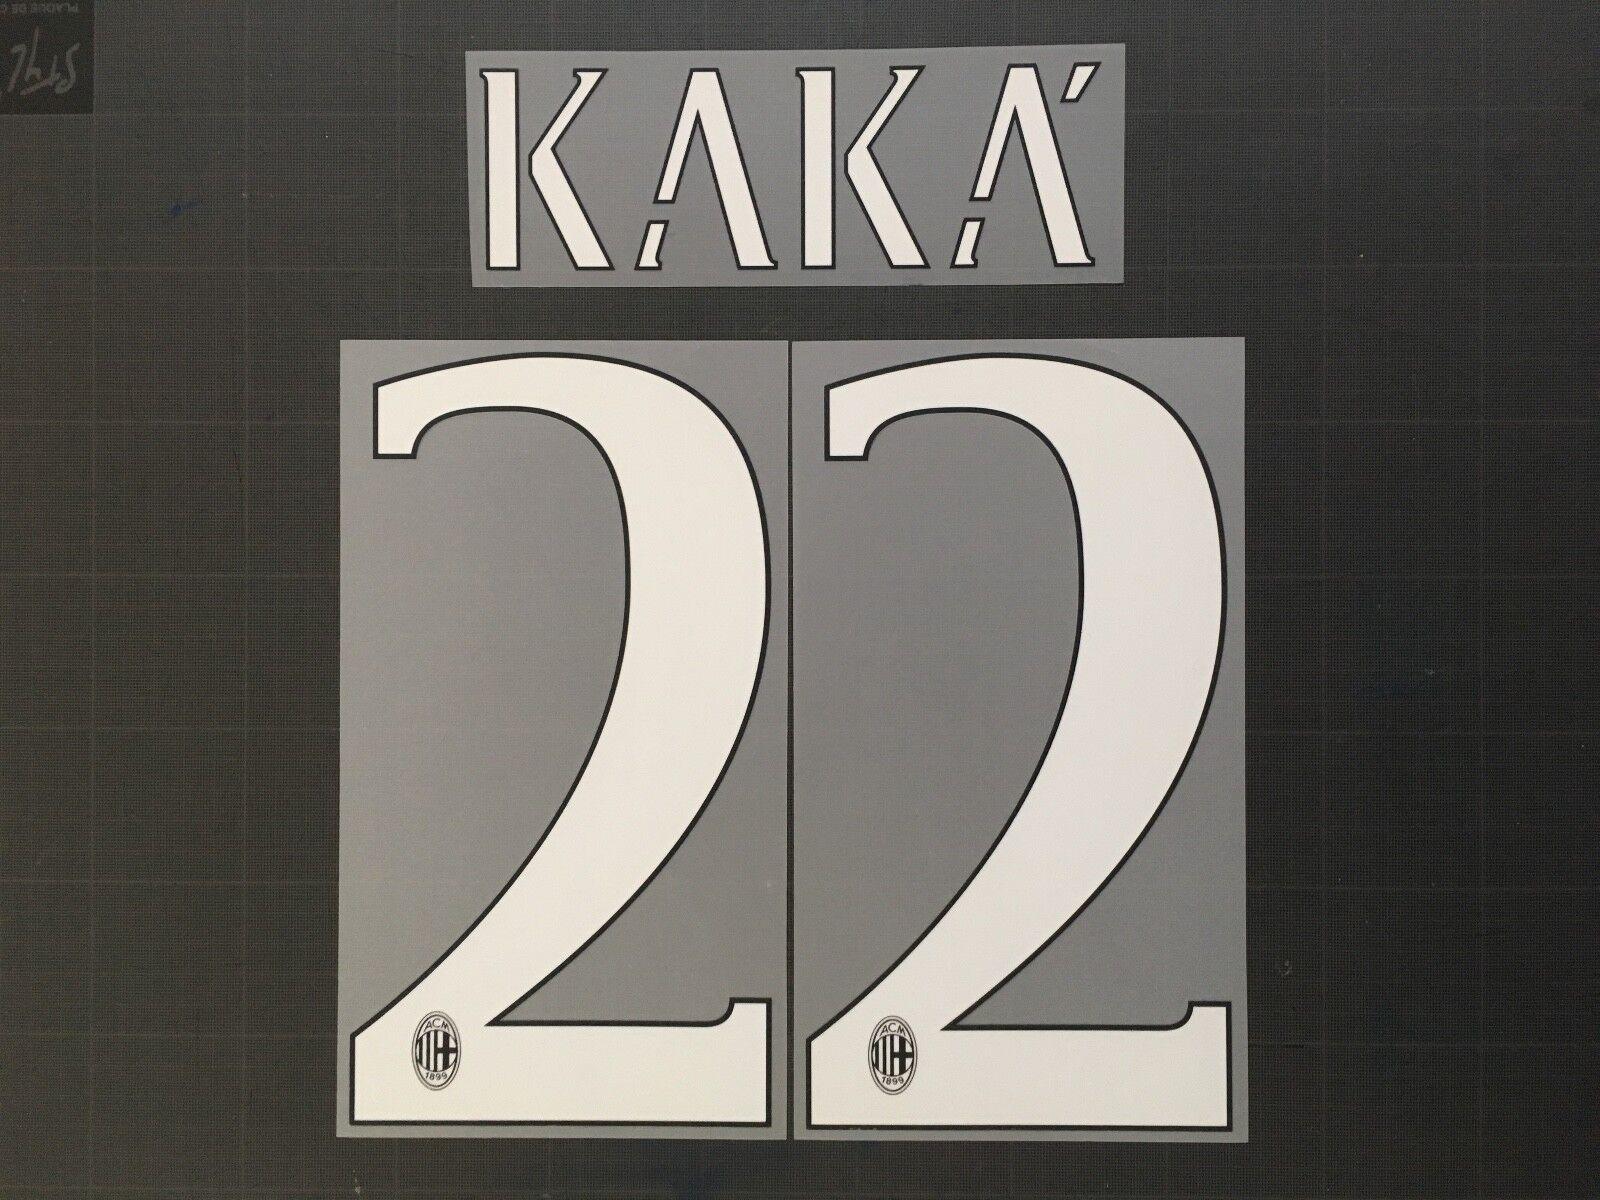 KAKA 22 AC MILAN HOME NAMESET FLOCAGE TRANSFERT STILSCREEN 14-15